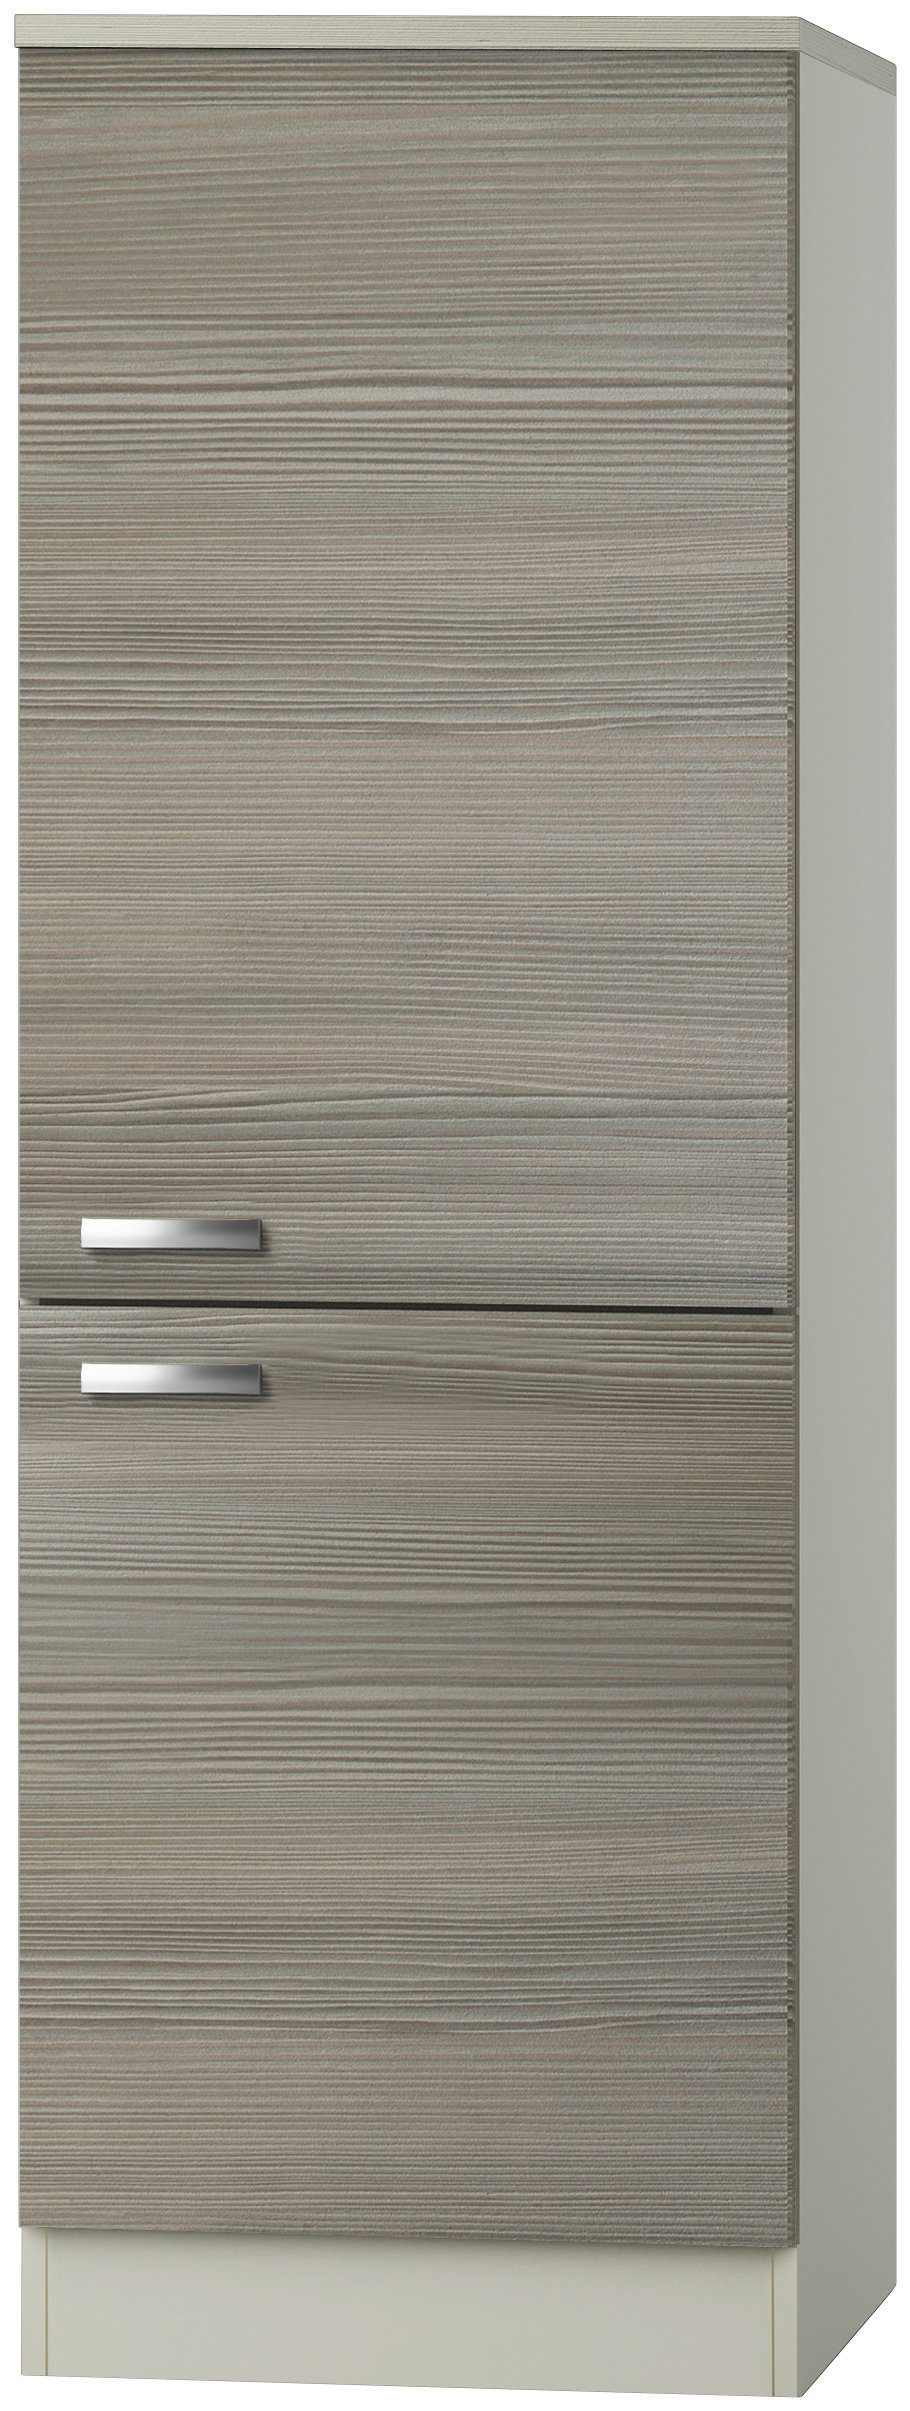 Kühlumbauschrank »Vigo, Höhe 174,4«, Breite 60 cm